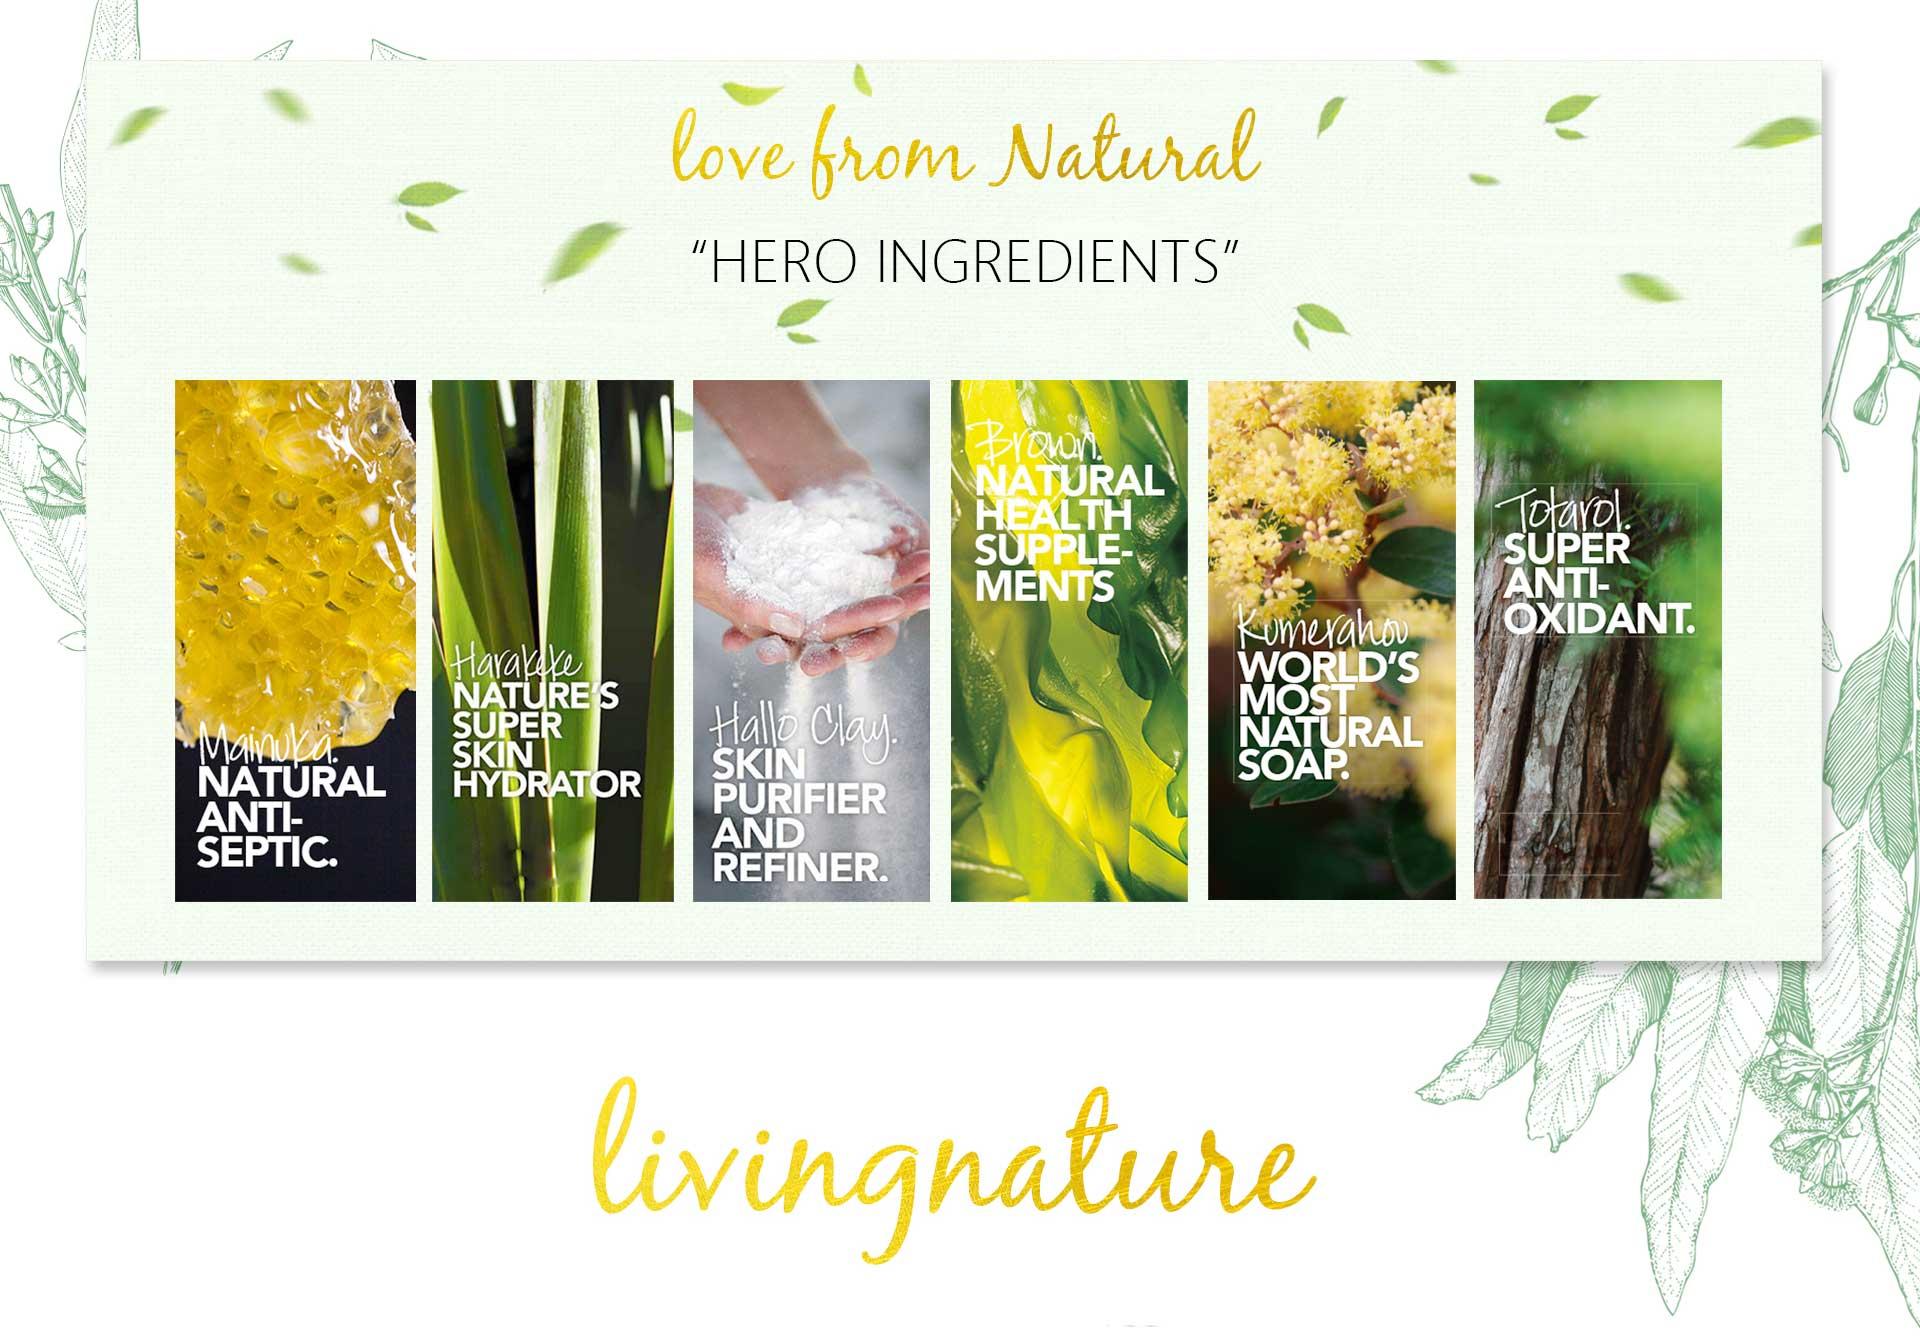 mỹ phẩm living nature